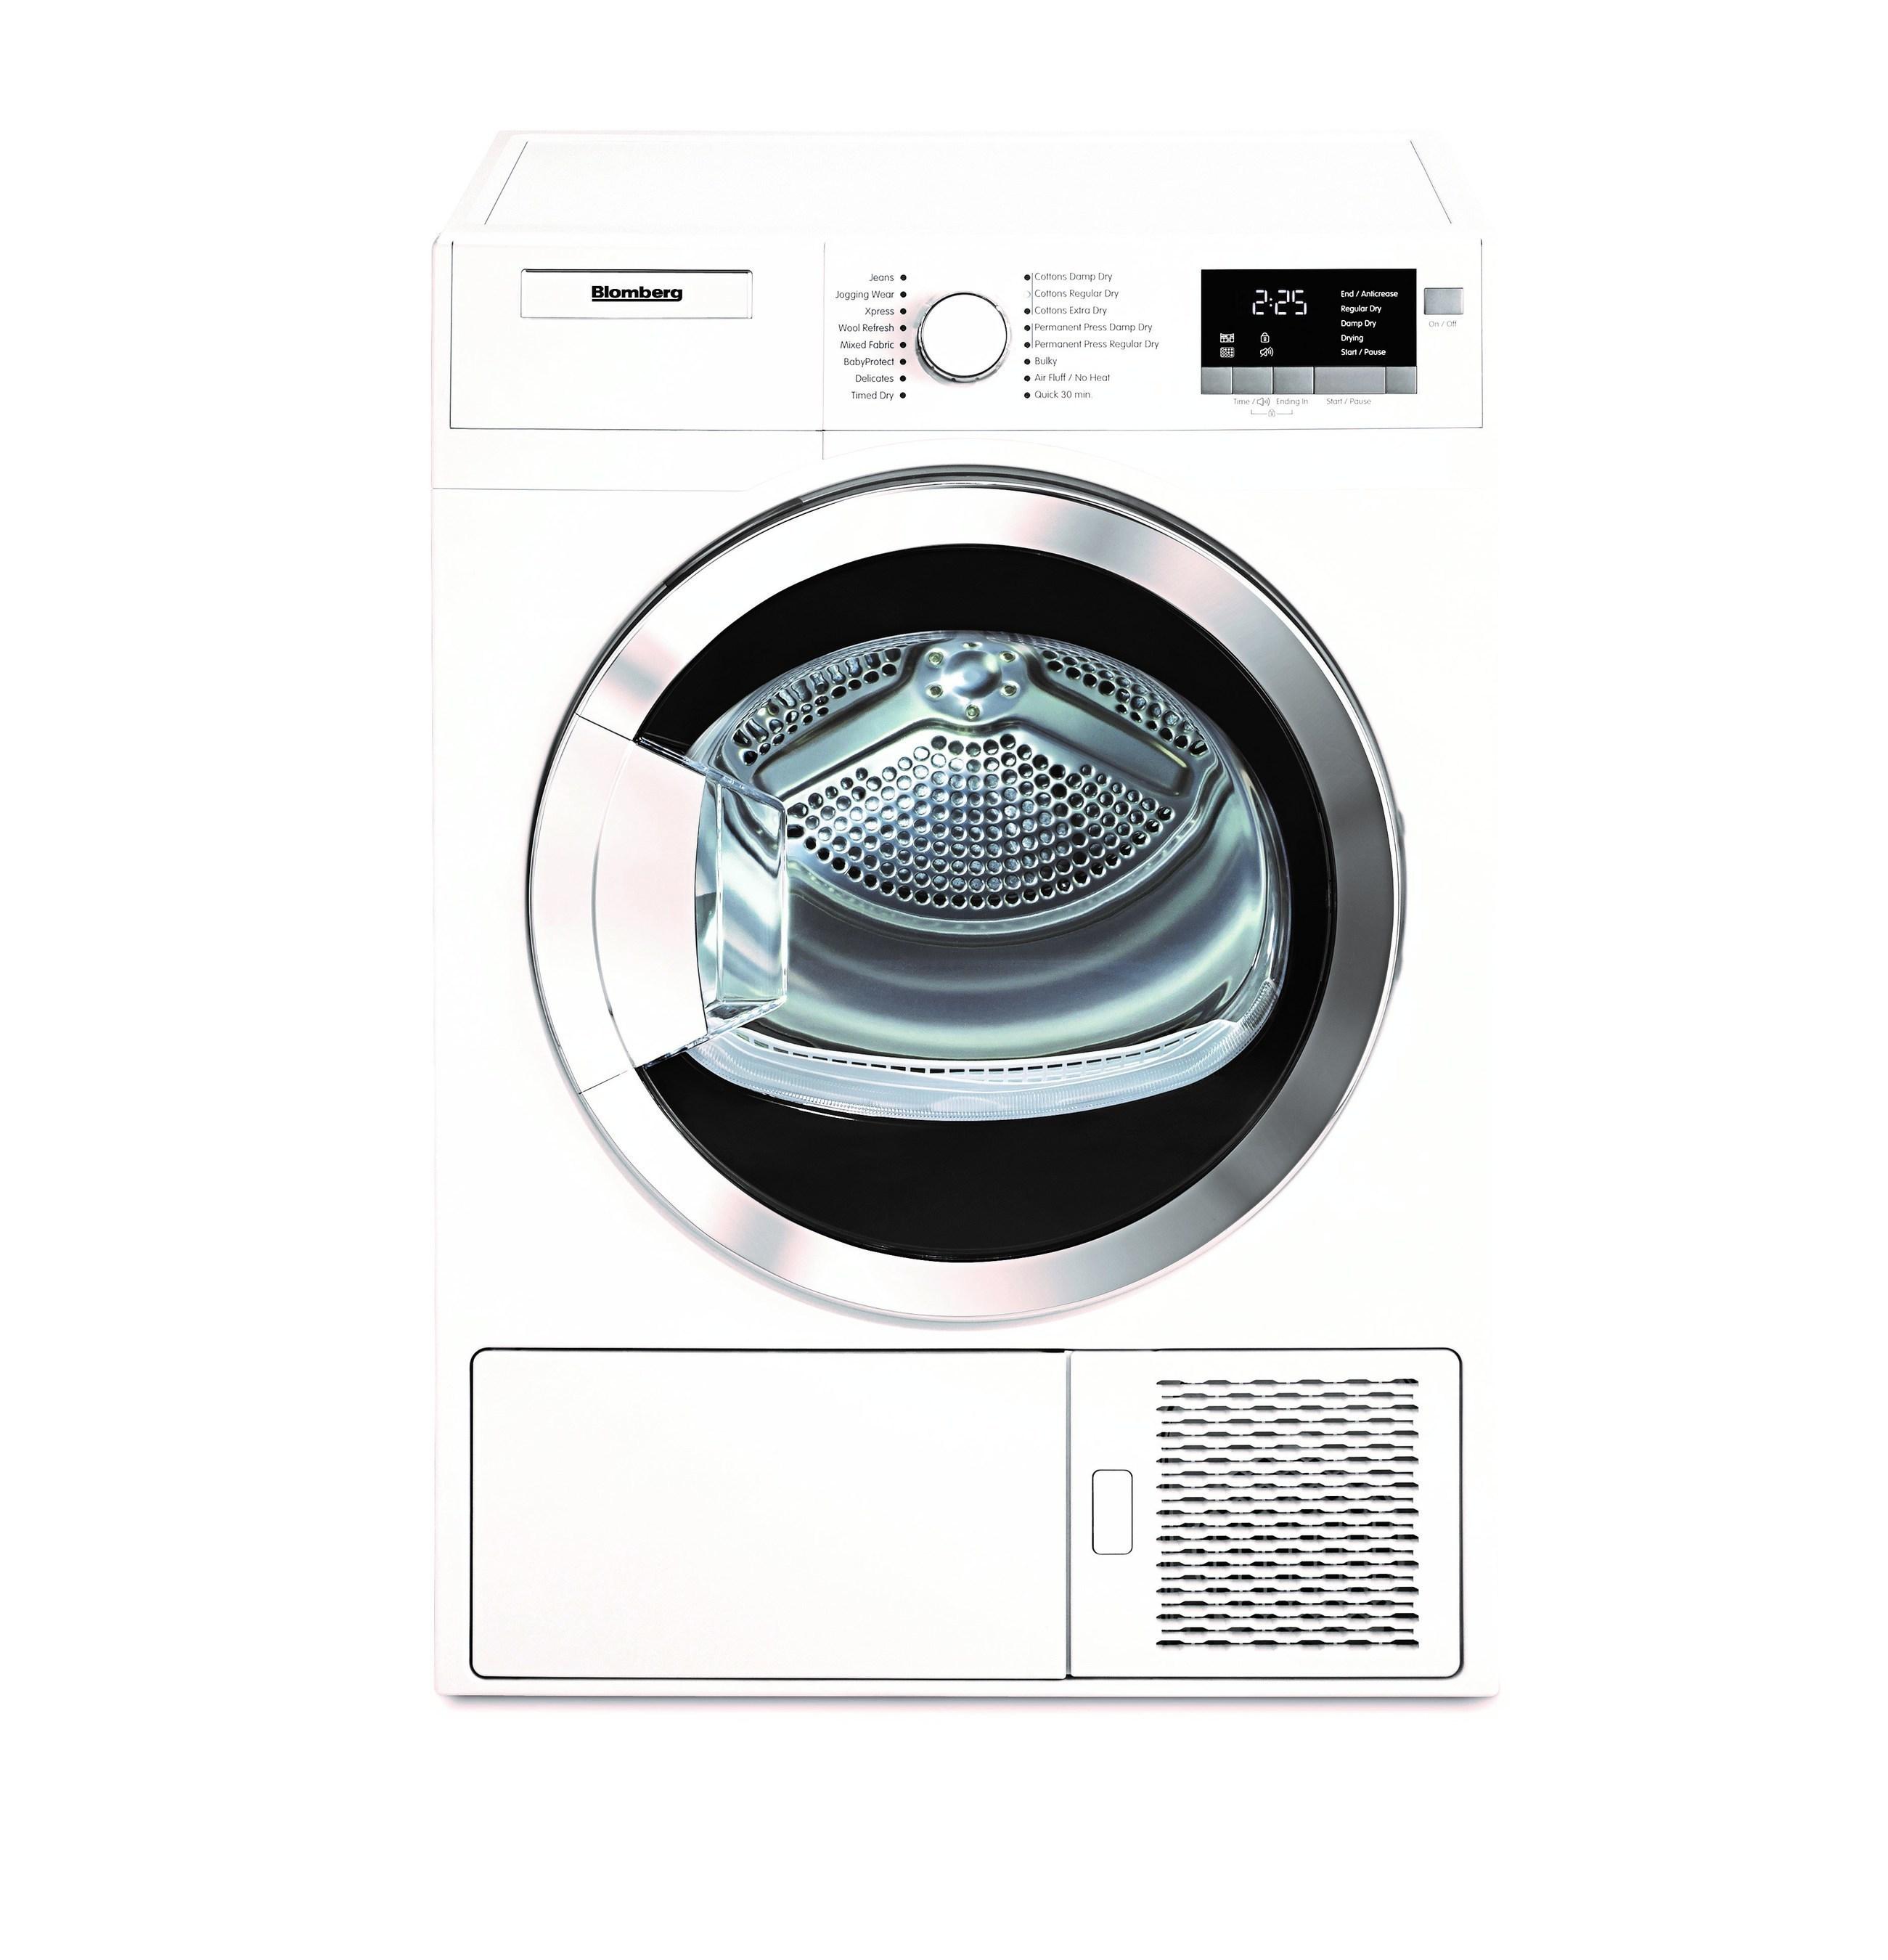 Blomberg Unveils Premium Energy-Efficient Appliances for Small-Space Living